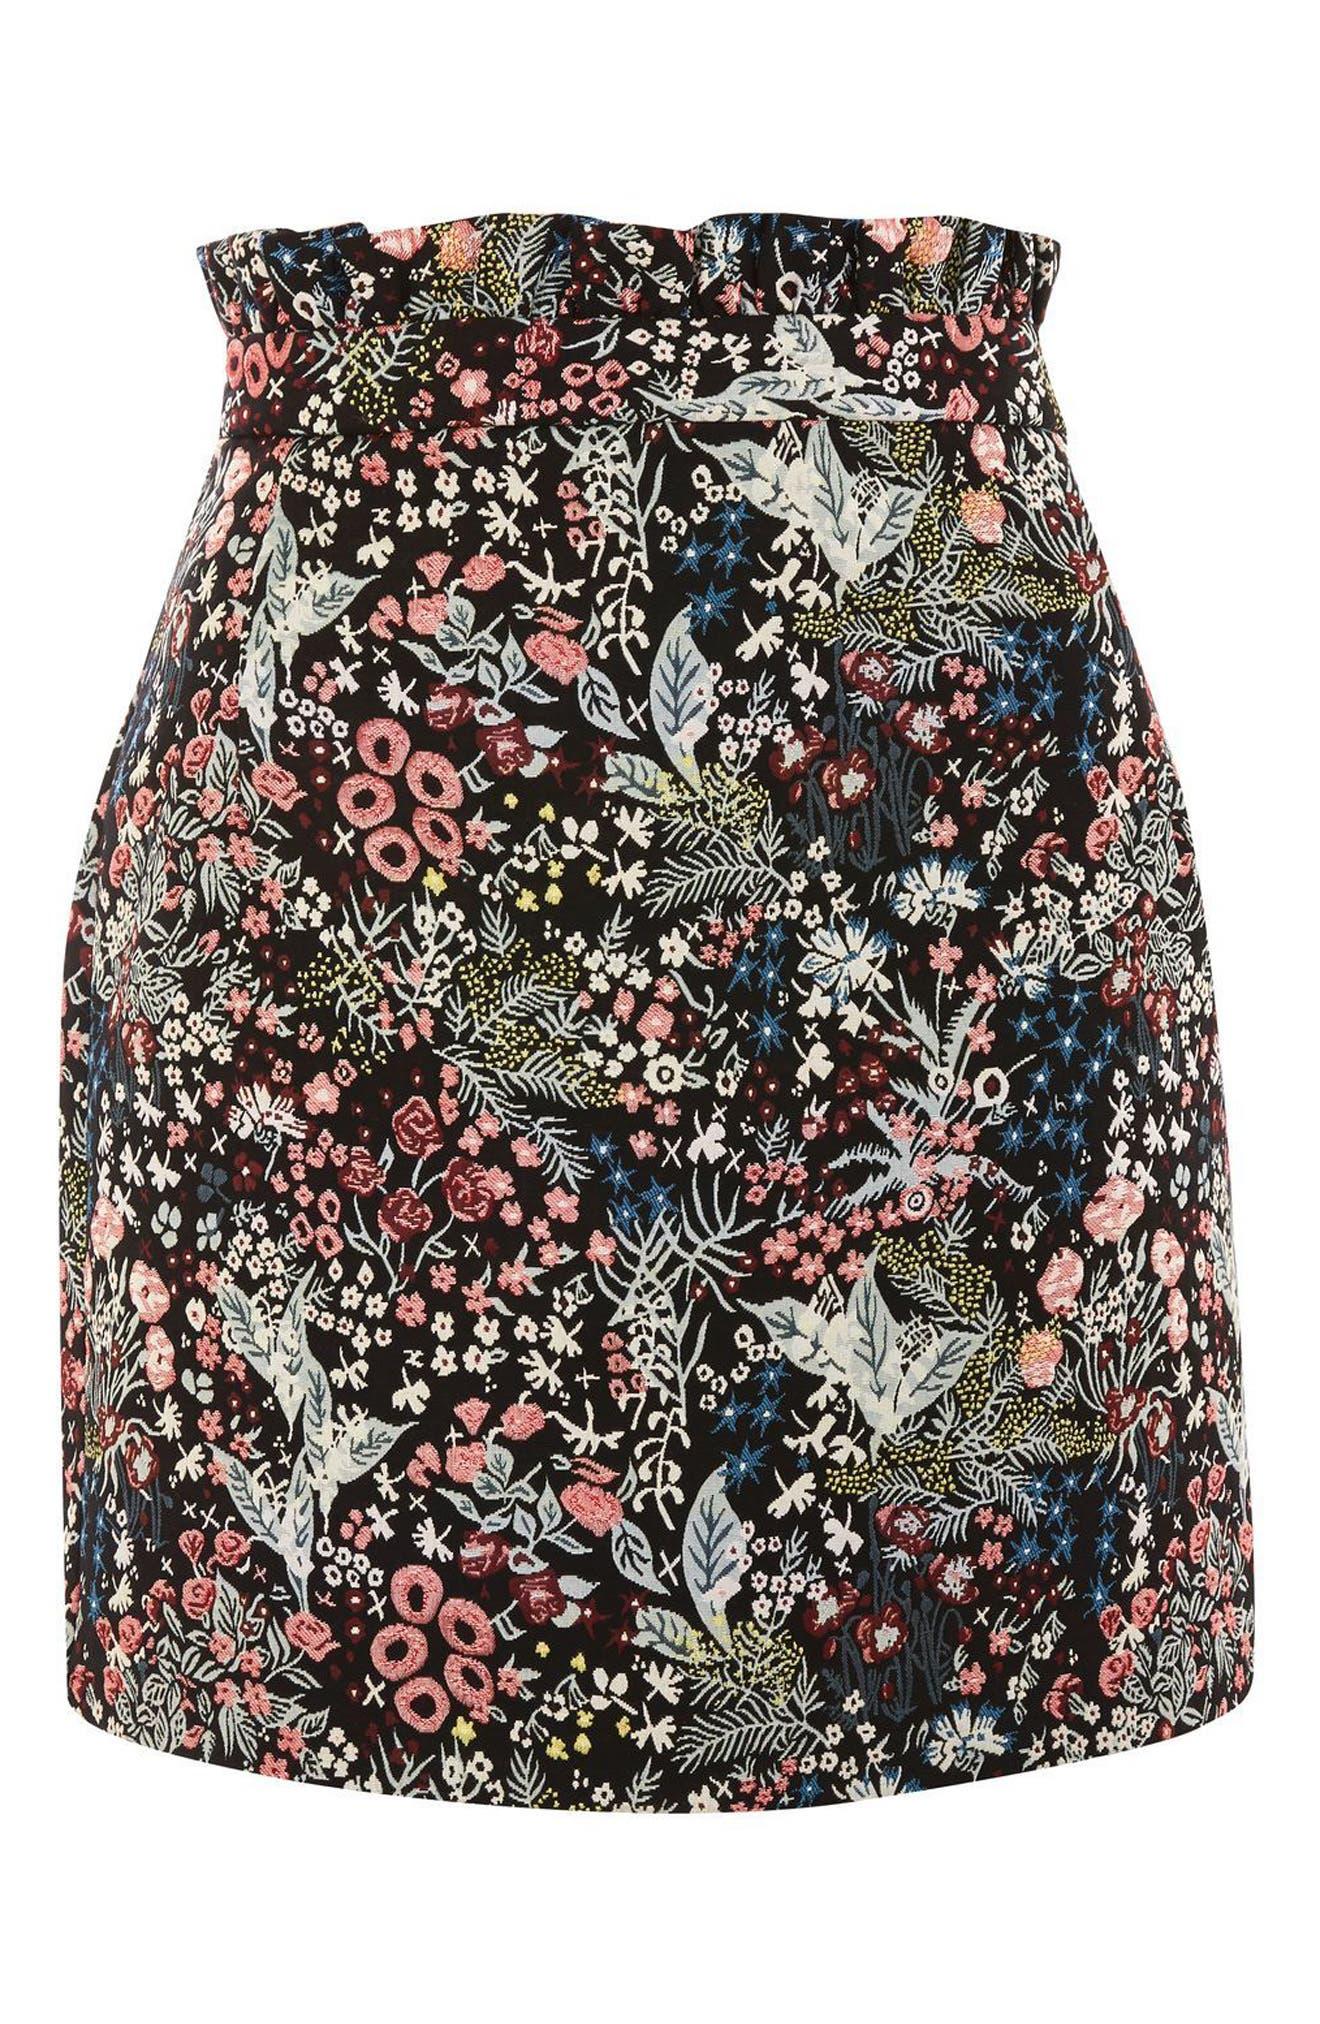 Woodland Jacquard Skirt,                             Alternate thumbnail 4, color,                             001